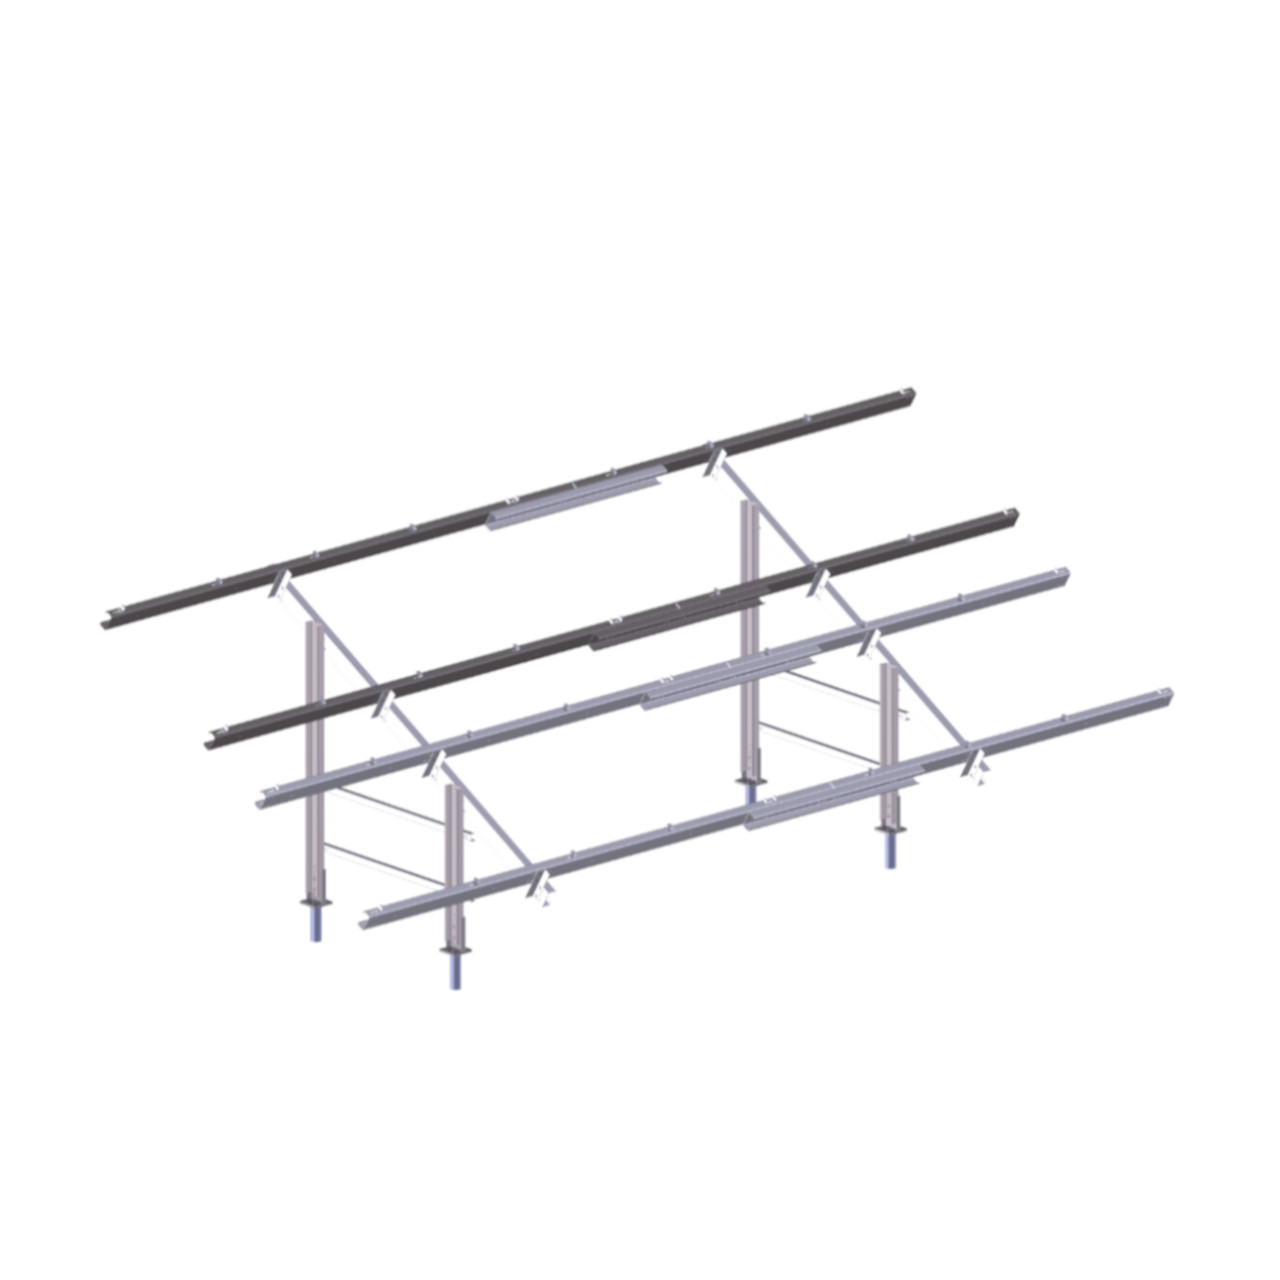 Polar Racking - PRU-D - No Panels